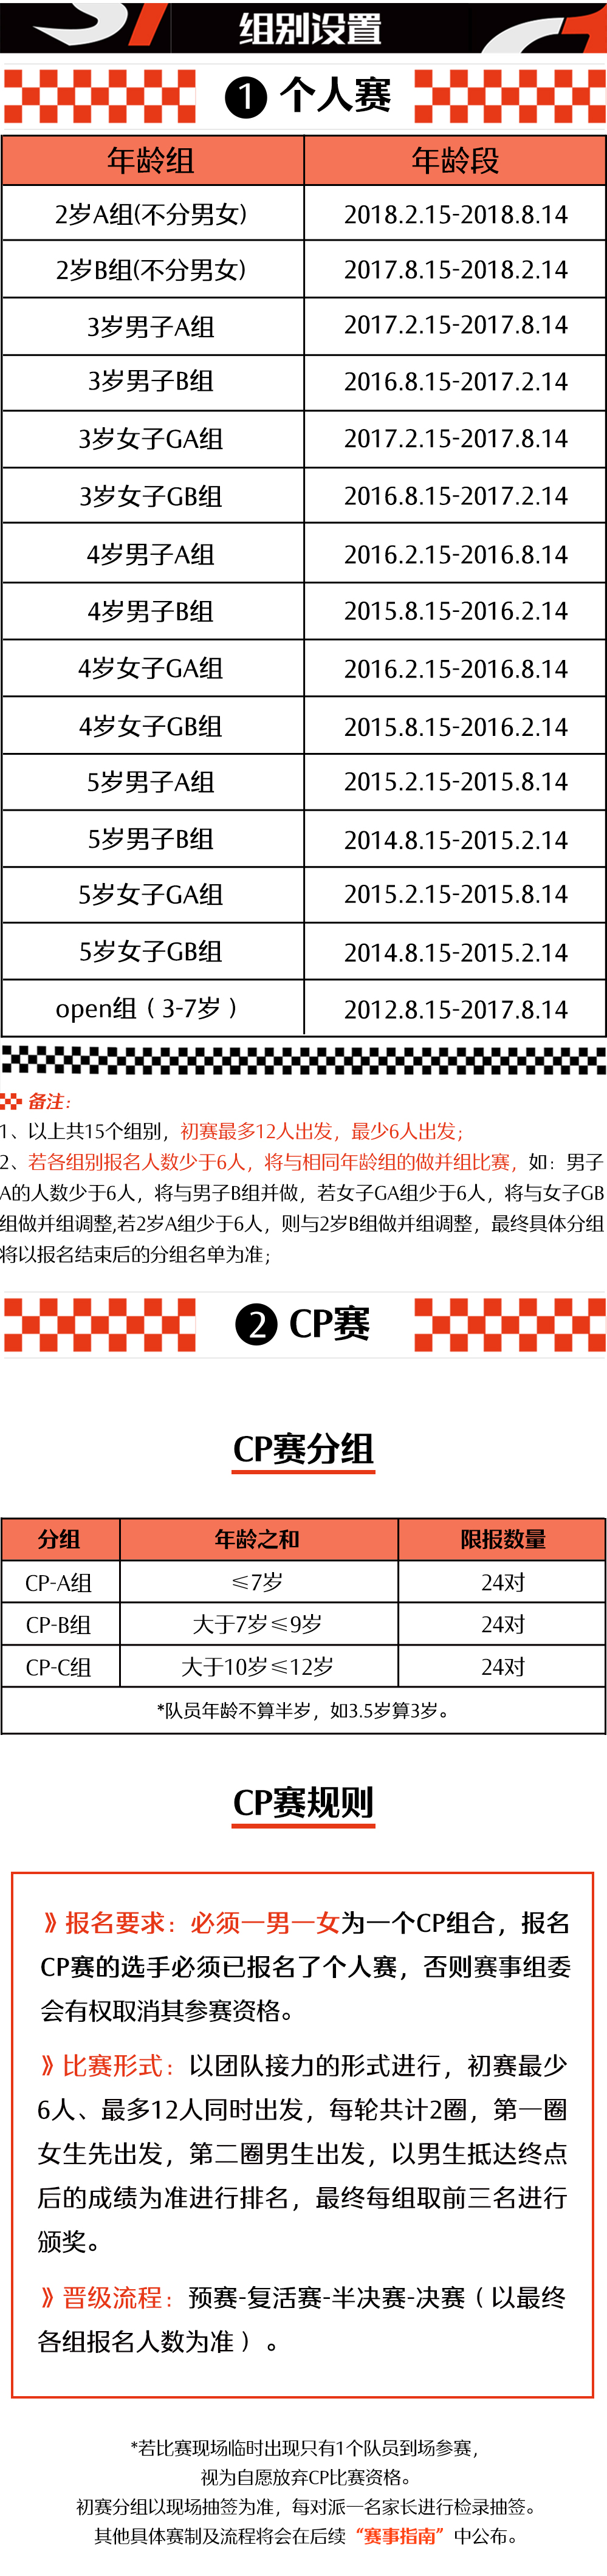 CP赛分组7.19.jpg